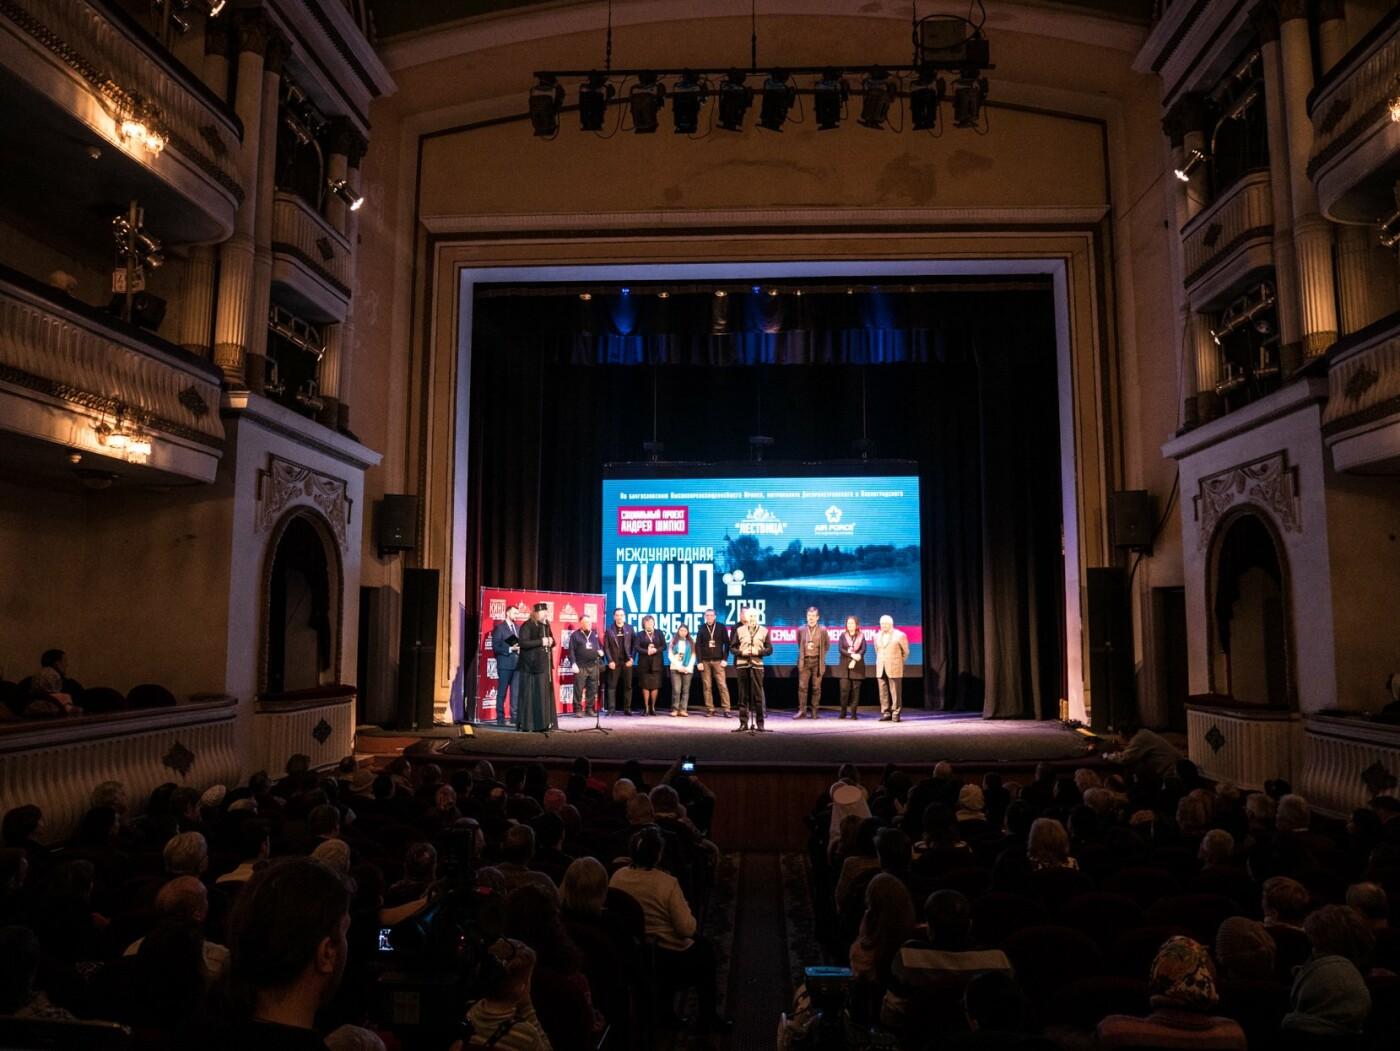 Киноассамблея на Днепре-2018: как прошла церемония открытия кинофорума (ФОТО), фото-4